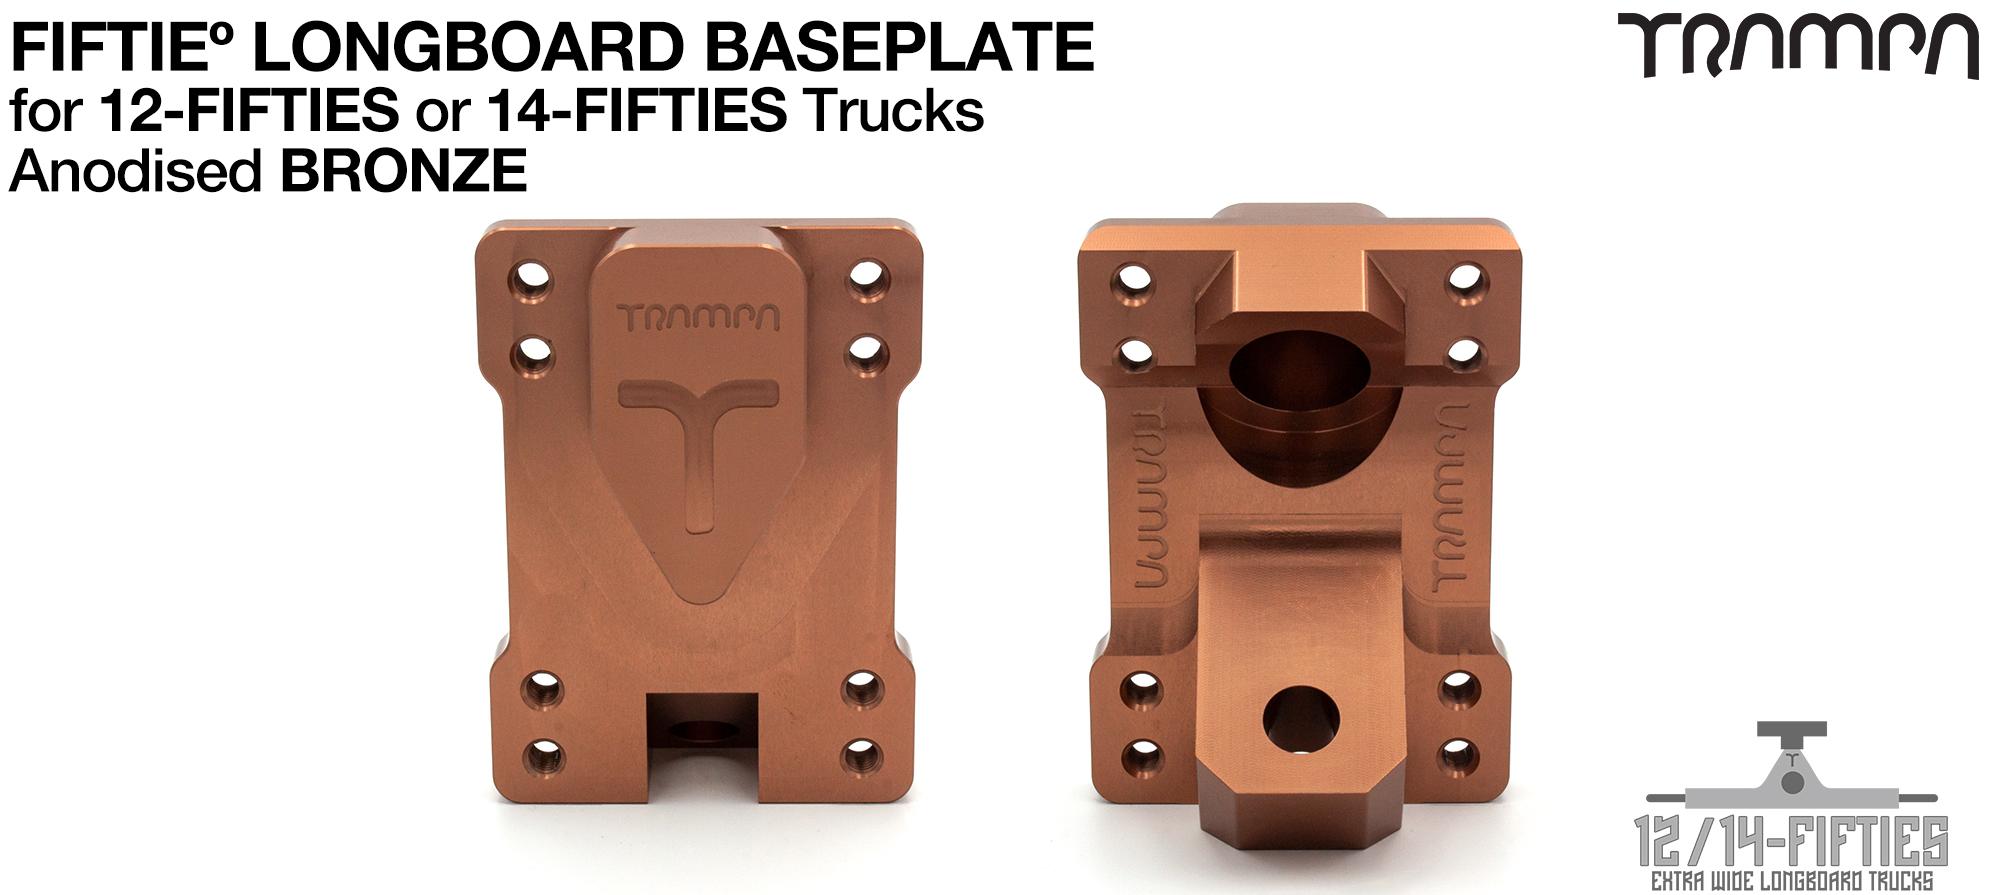 TRAMPA 12 & 14Fifties Extra Wide Longboard Truck BASEPLATE - BRONZE